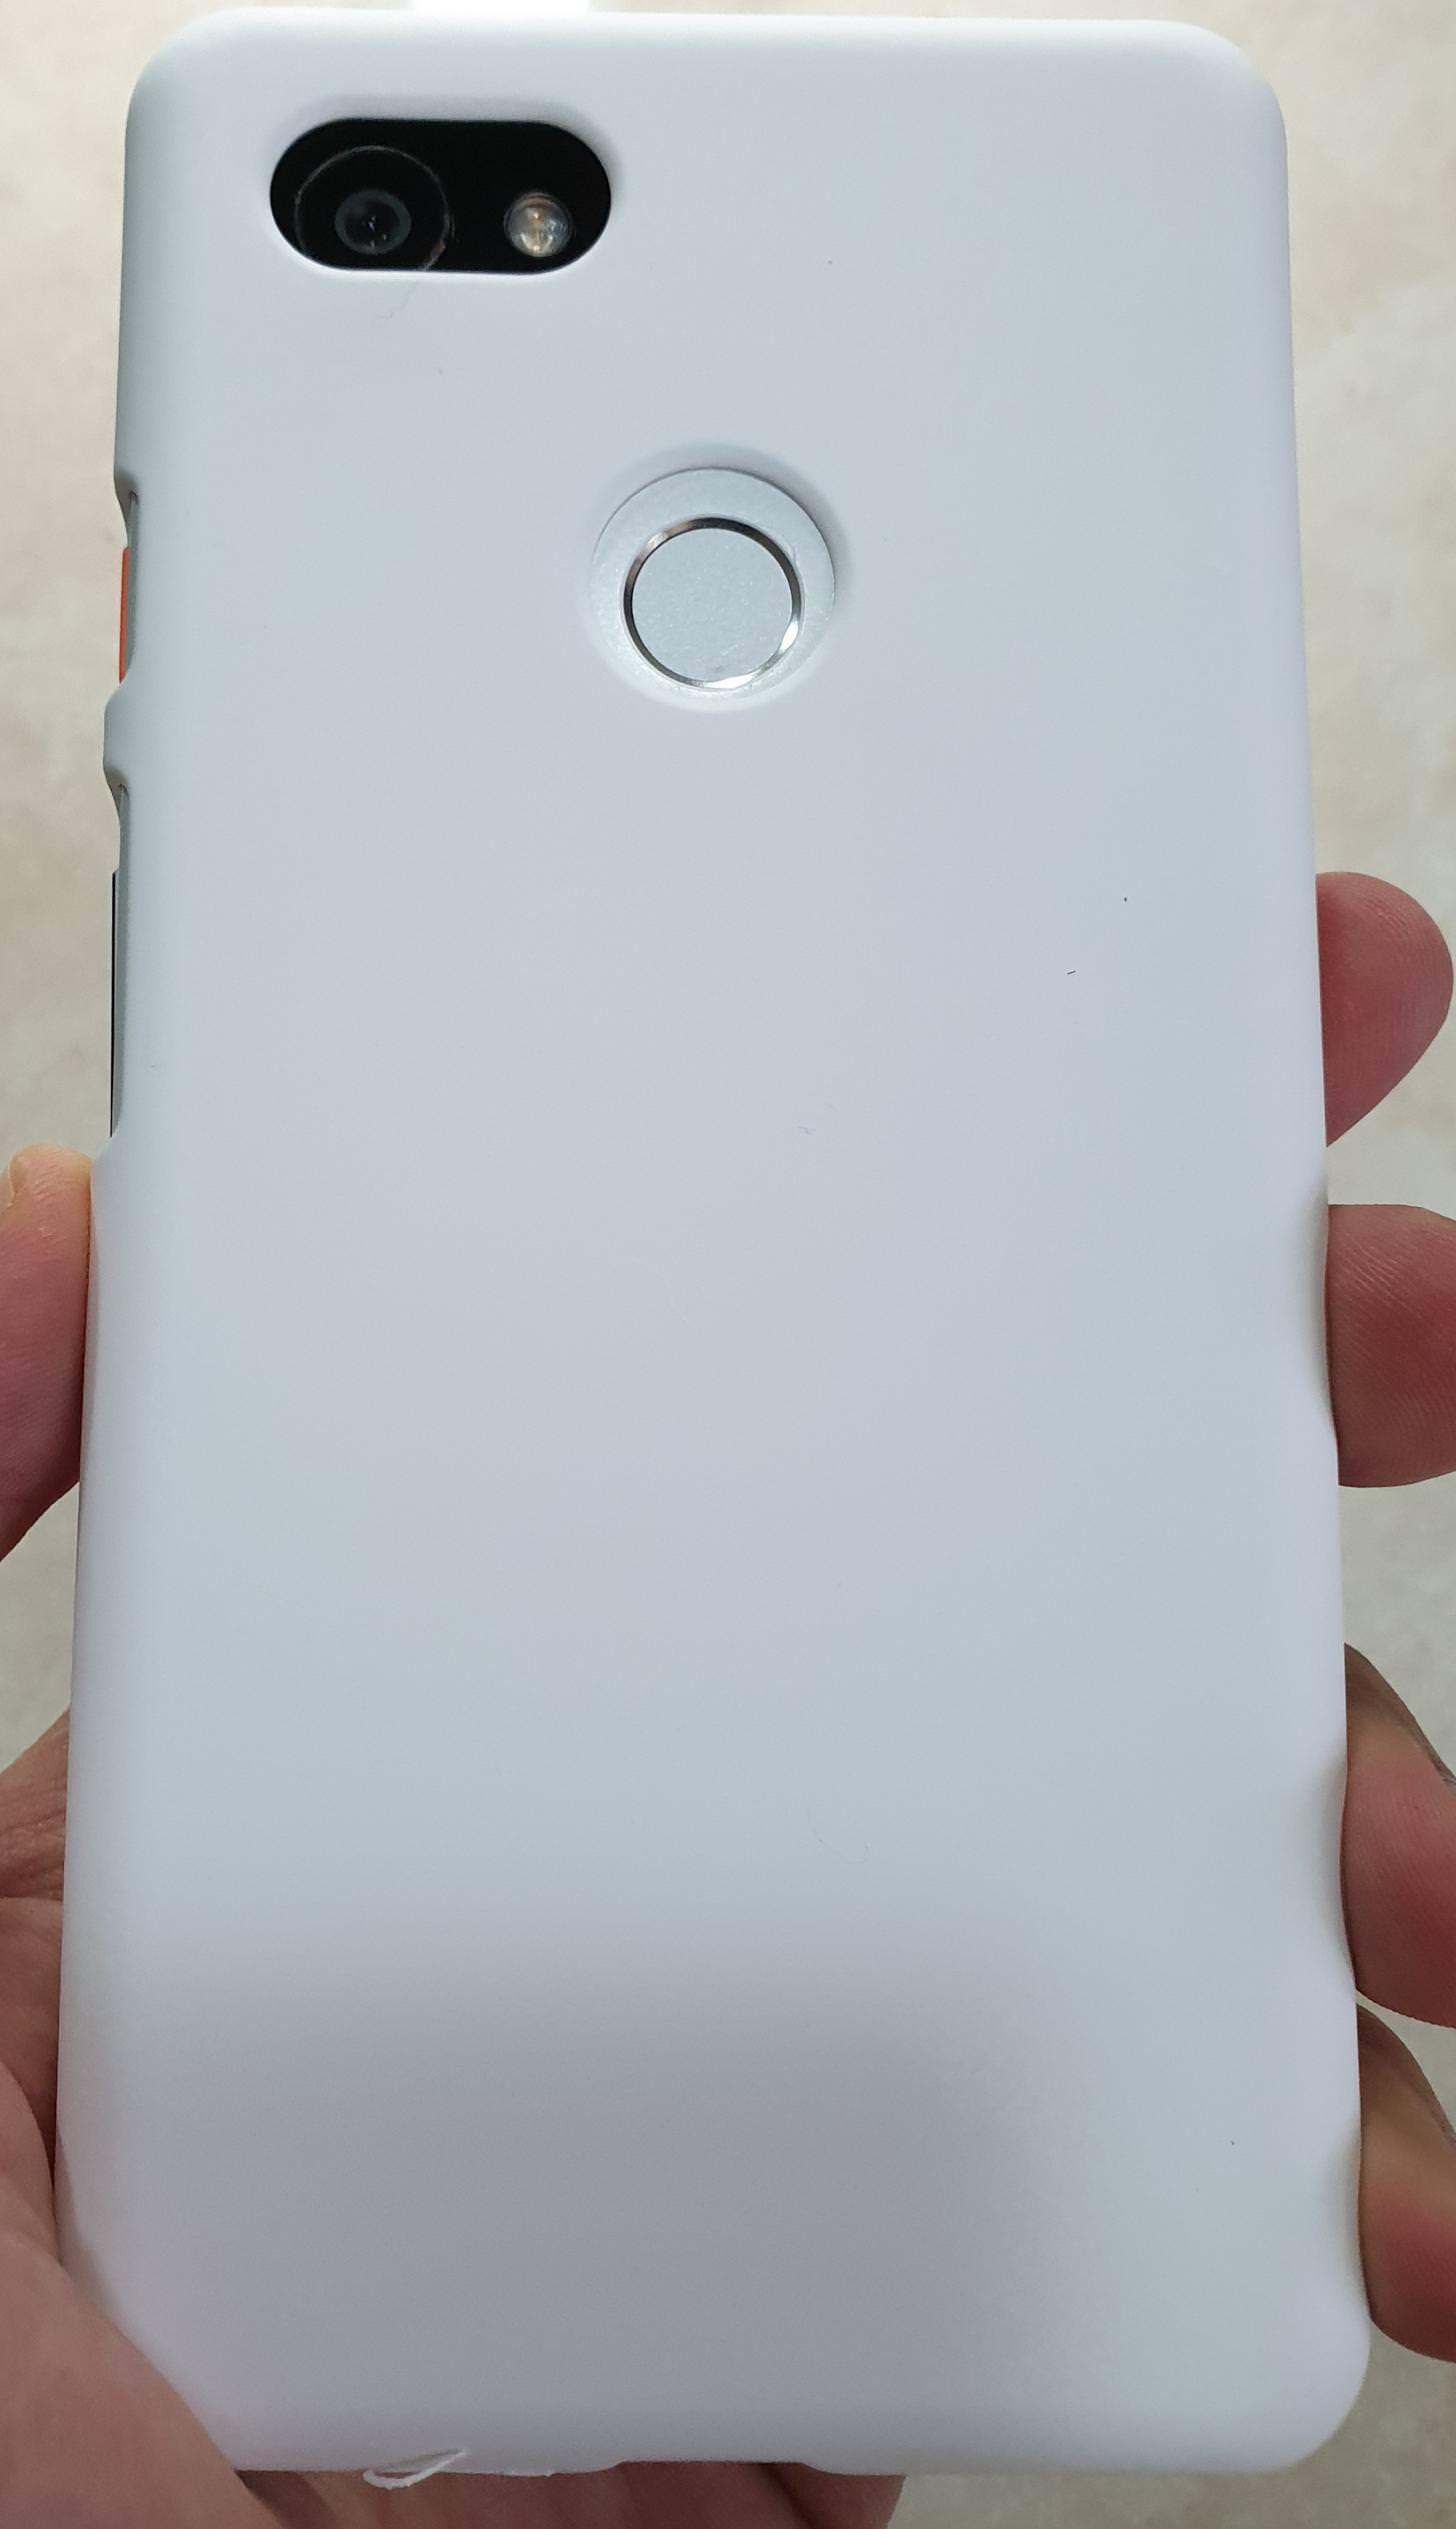 Google Pixel 3 Xl Pixel 2 Xl Cases Will Not Be Interchangeable